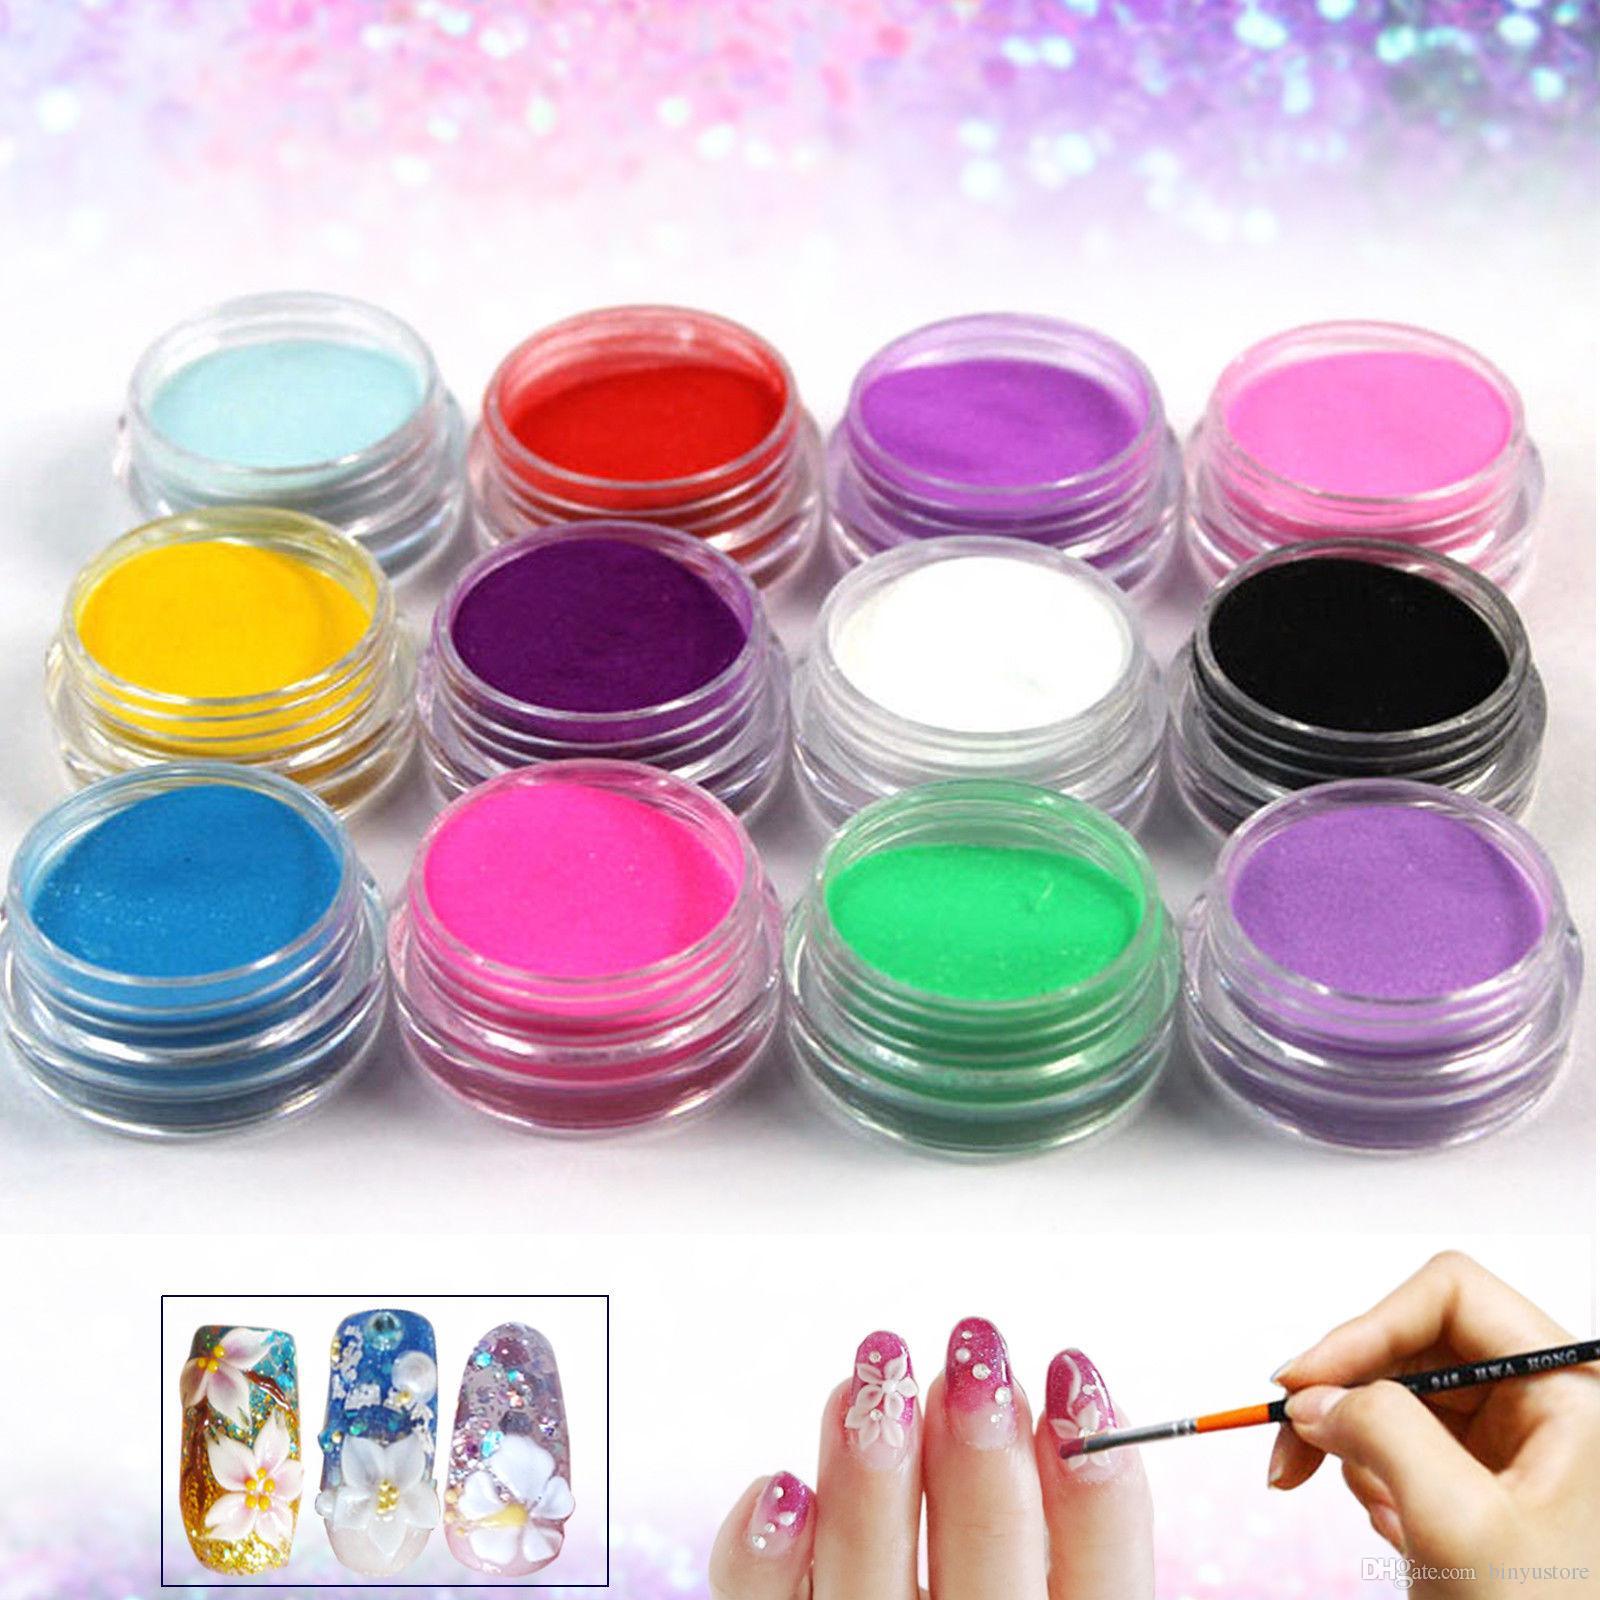 Venta caliente 12 UNIDS / Pot Mix Mix Colors Set Nail Art Polvo Acrílico En Polvo Decoración Para Uñas Consejos